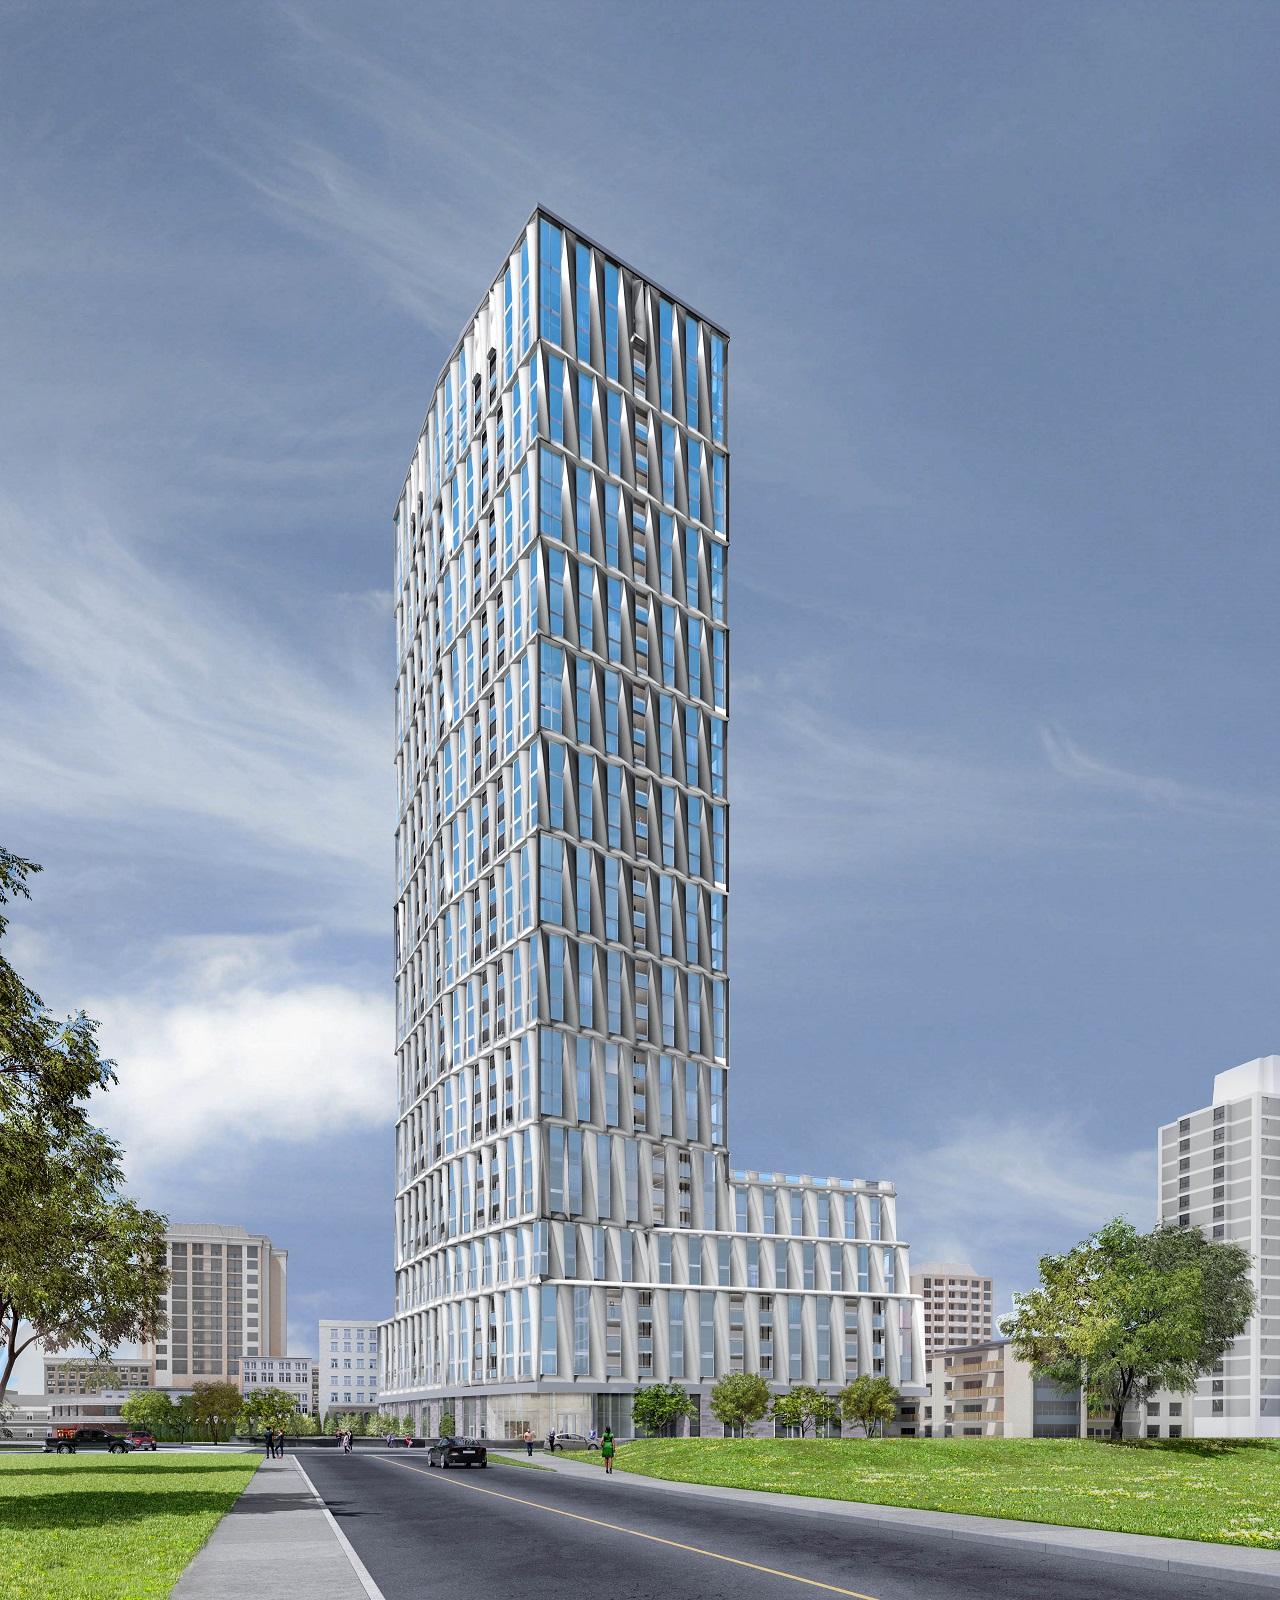 185 Balliol Street, SmartCentres REIT, Greenwin, Diamond Schmitt Architects, Toronto